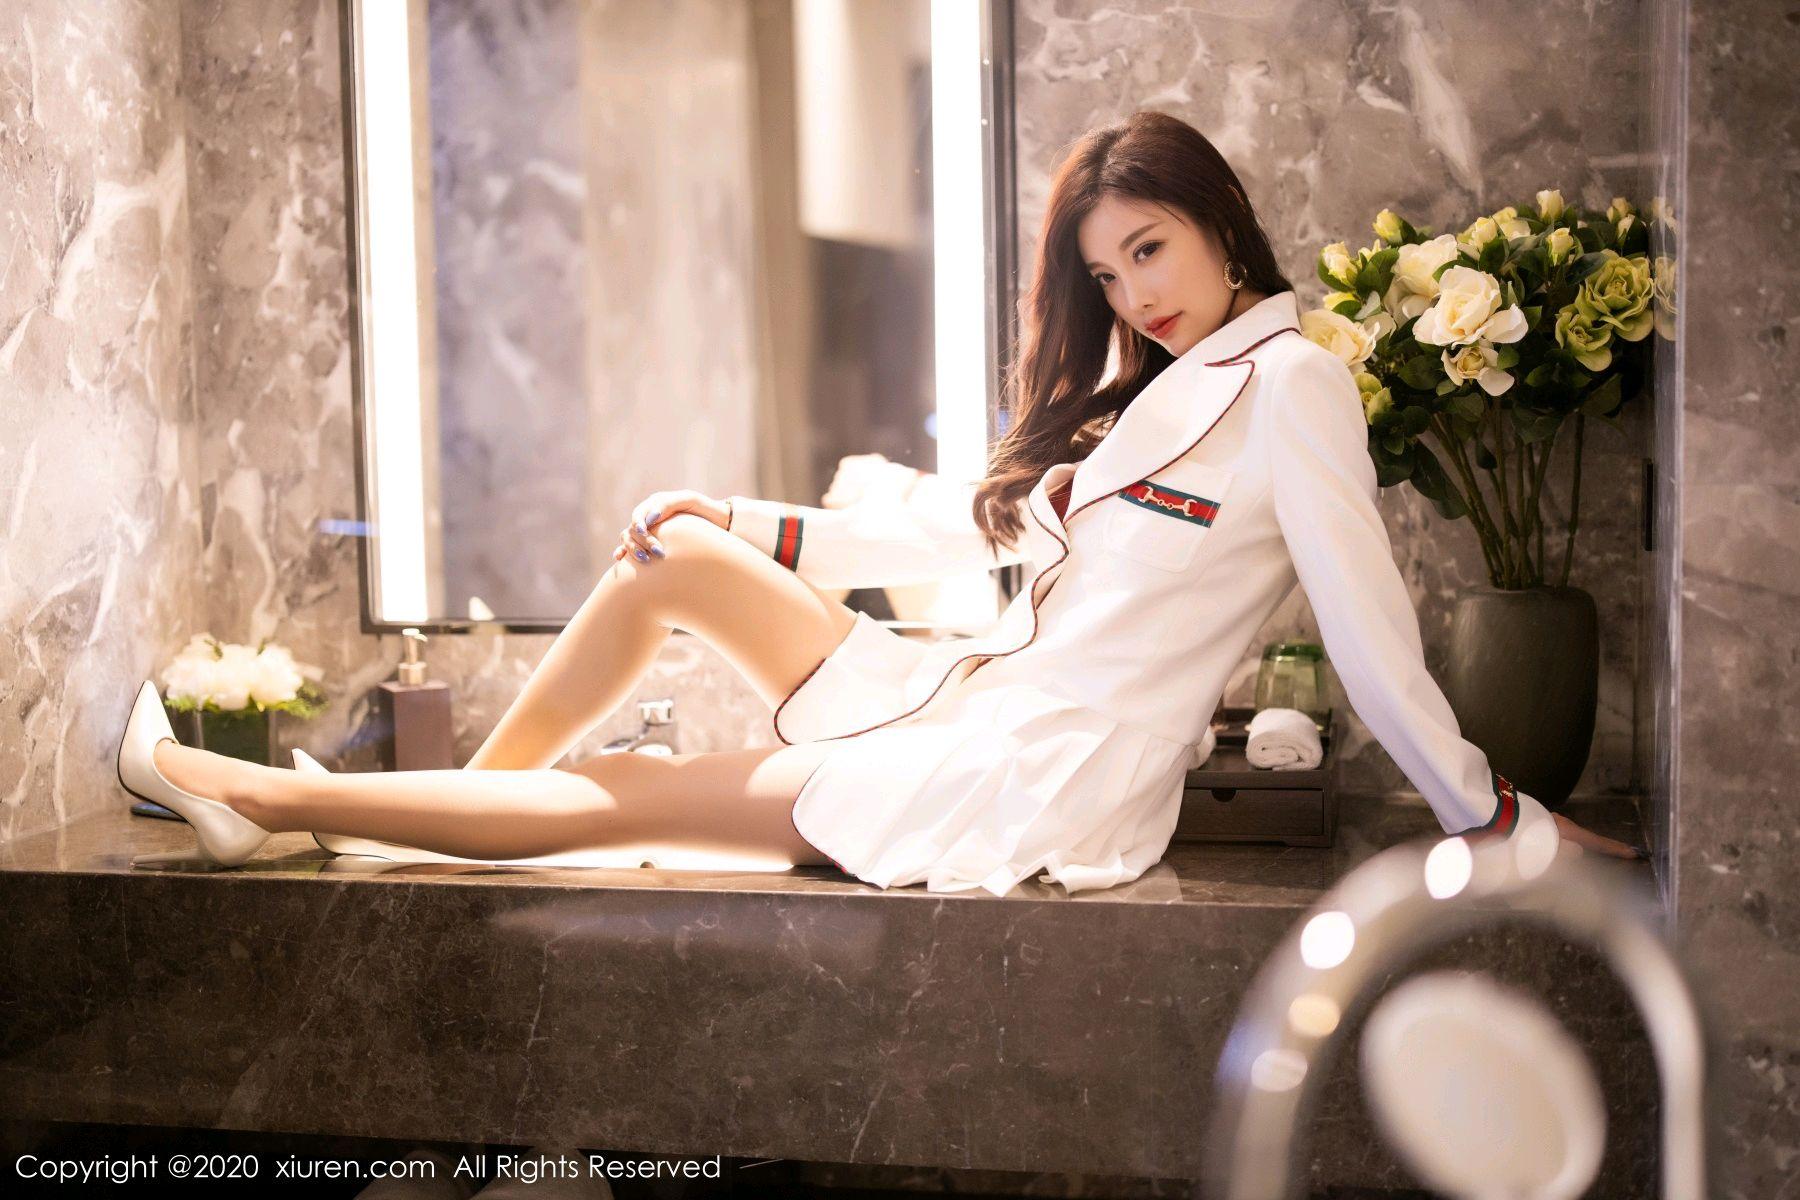 [XiuRen] Vol.2671 Yang Chen Chen 15P, Underwear, Xiuren, Yang Chen Chen